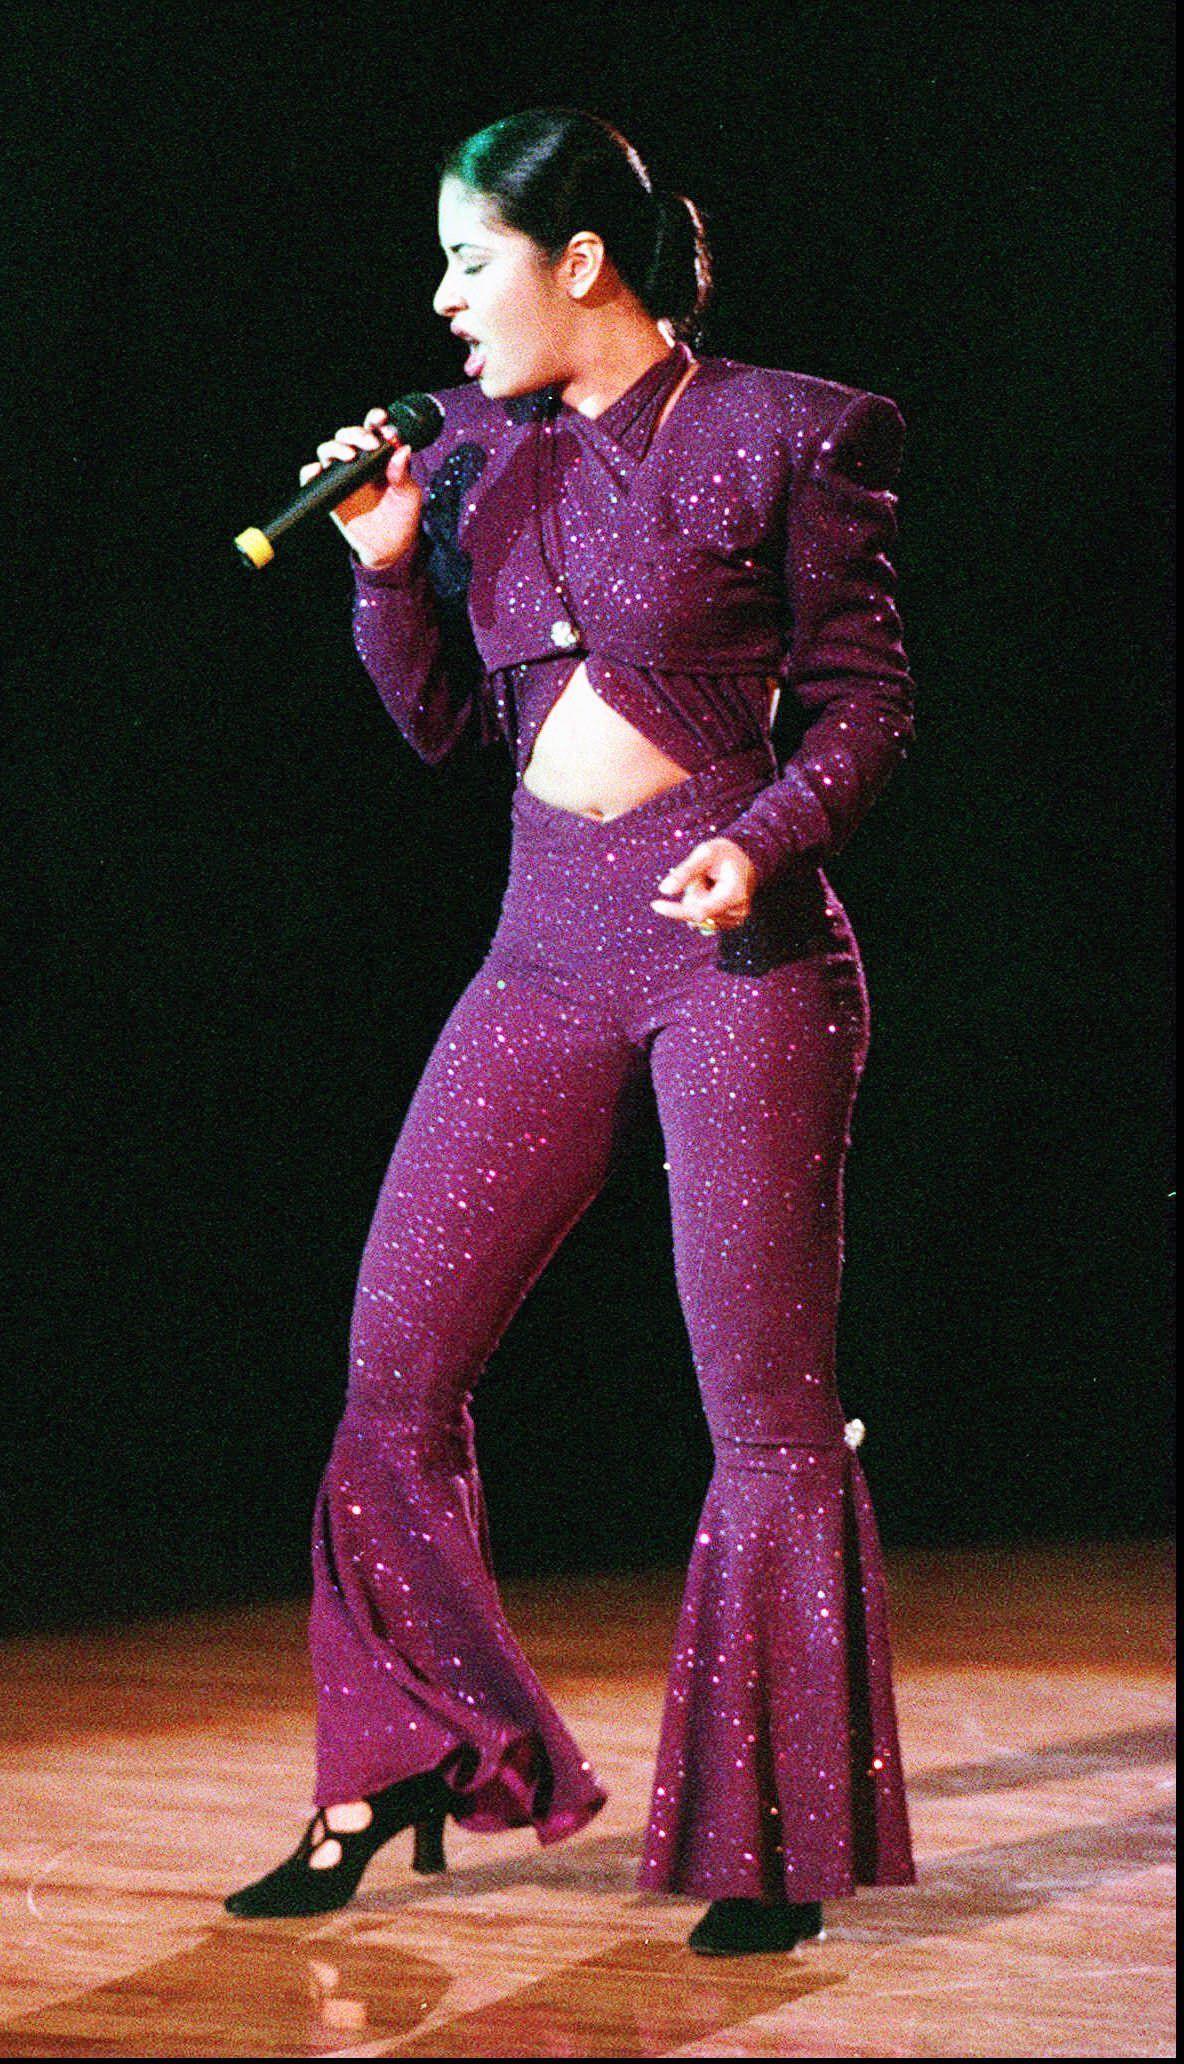 selena quintanilla outfits - Google Search | Selena ...